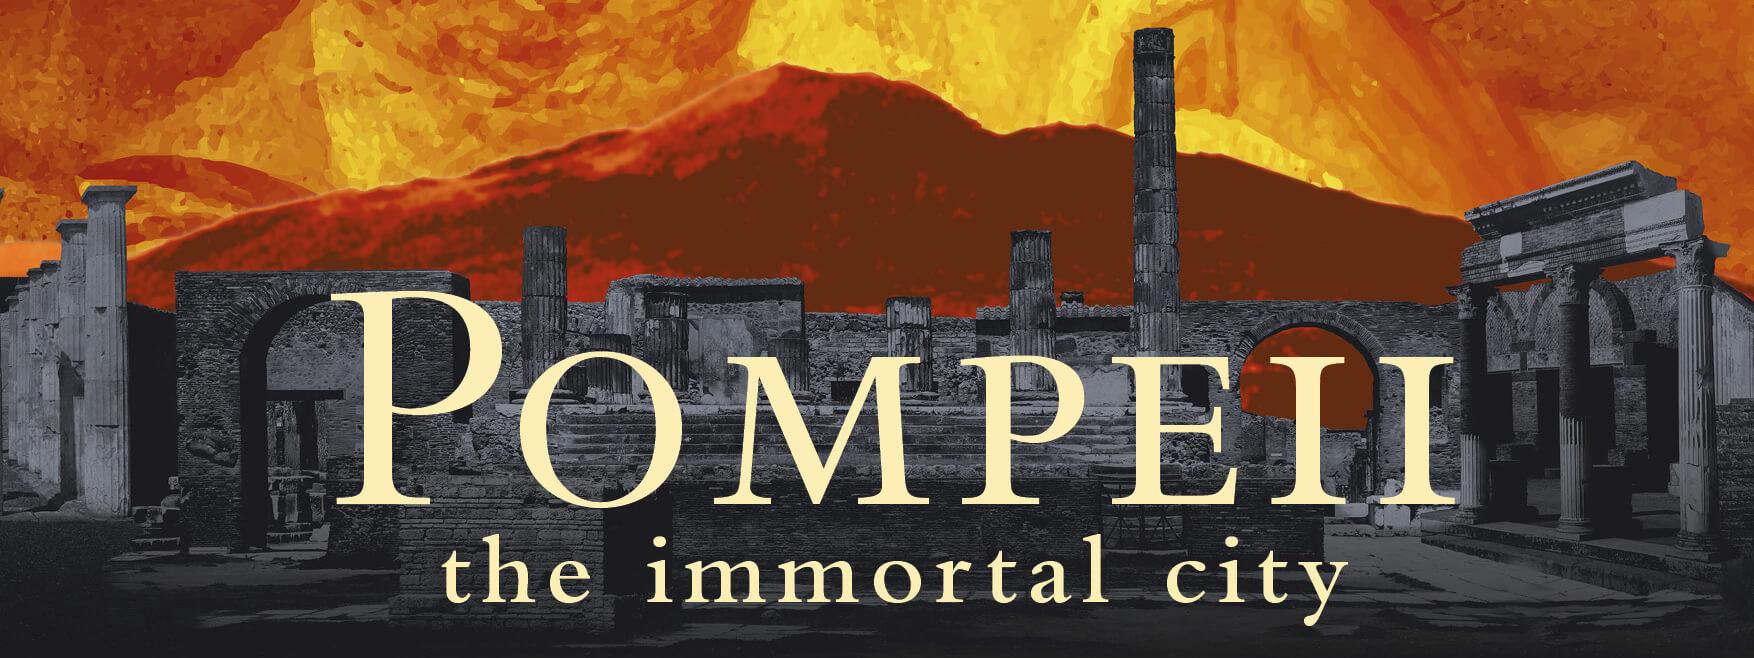 Pompeii: The Immortal City